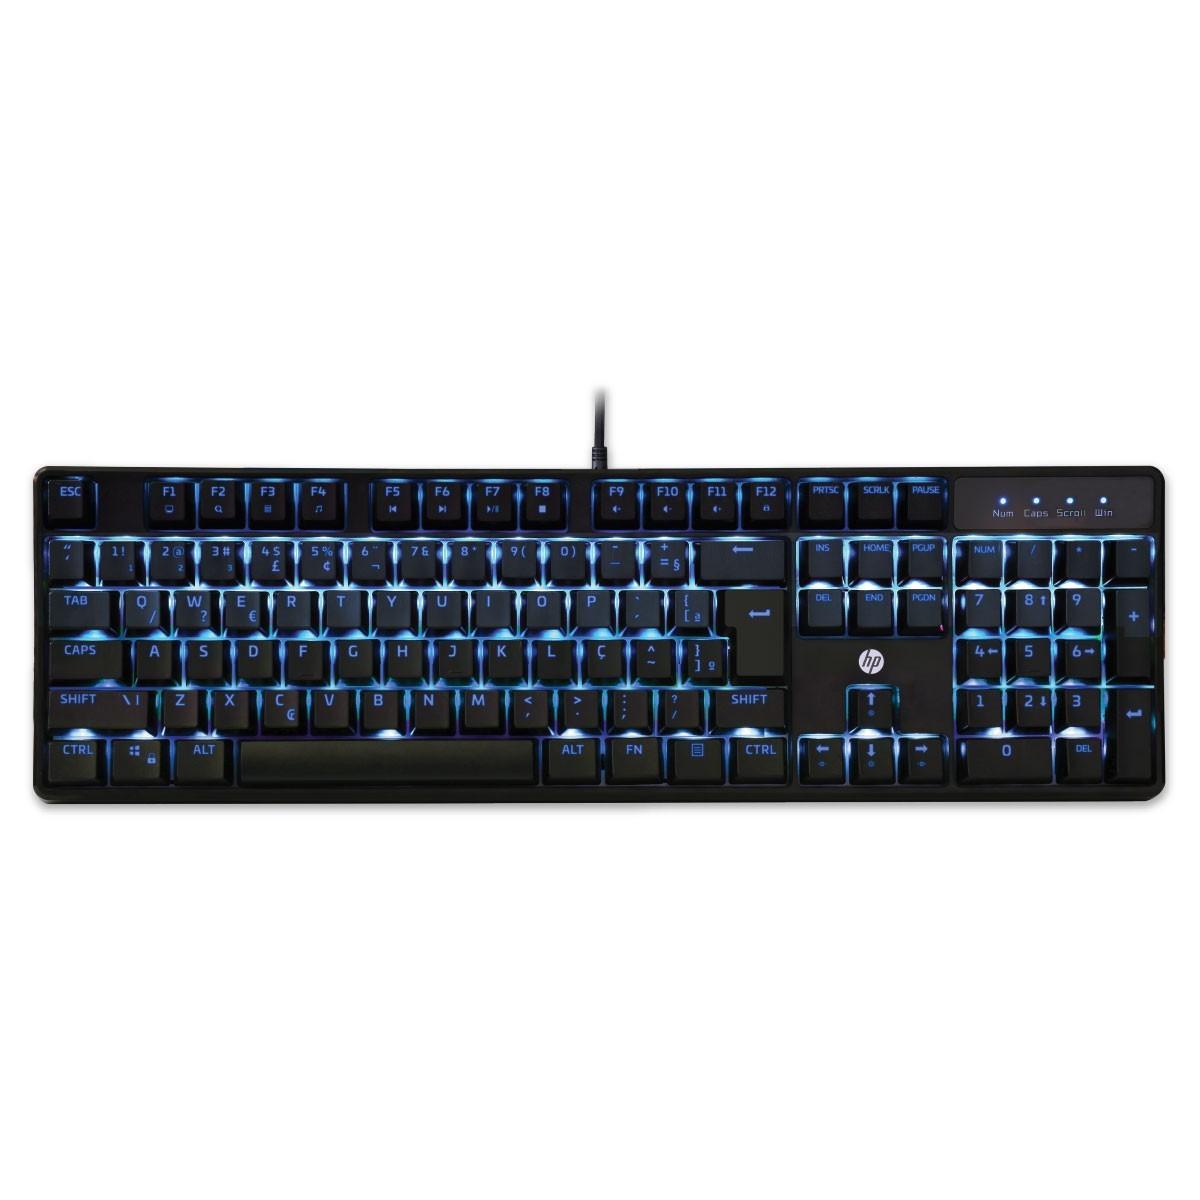 Teclado Mecânico HP Gamer GK320 Black ABNT2 Switch Blue